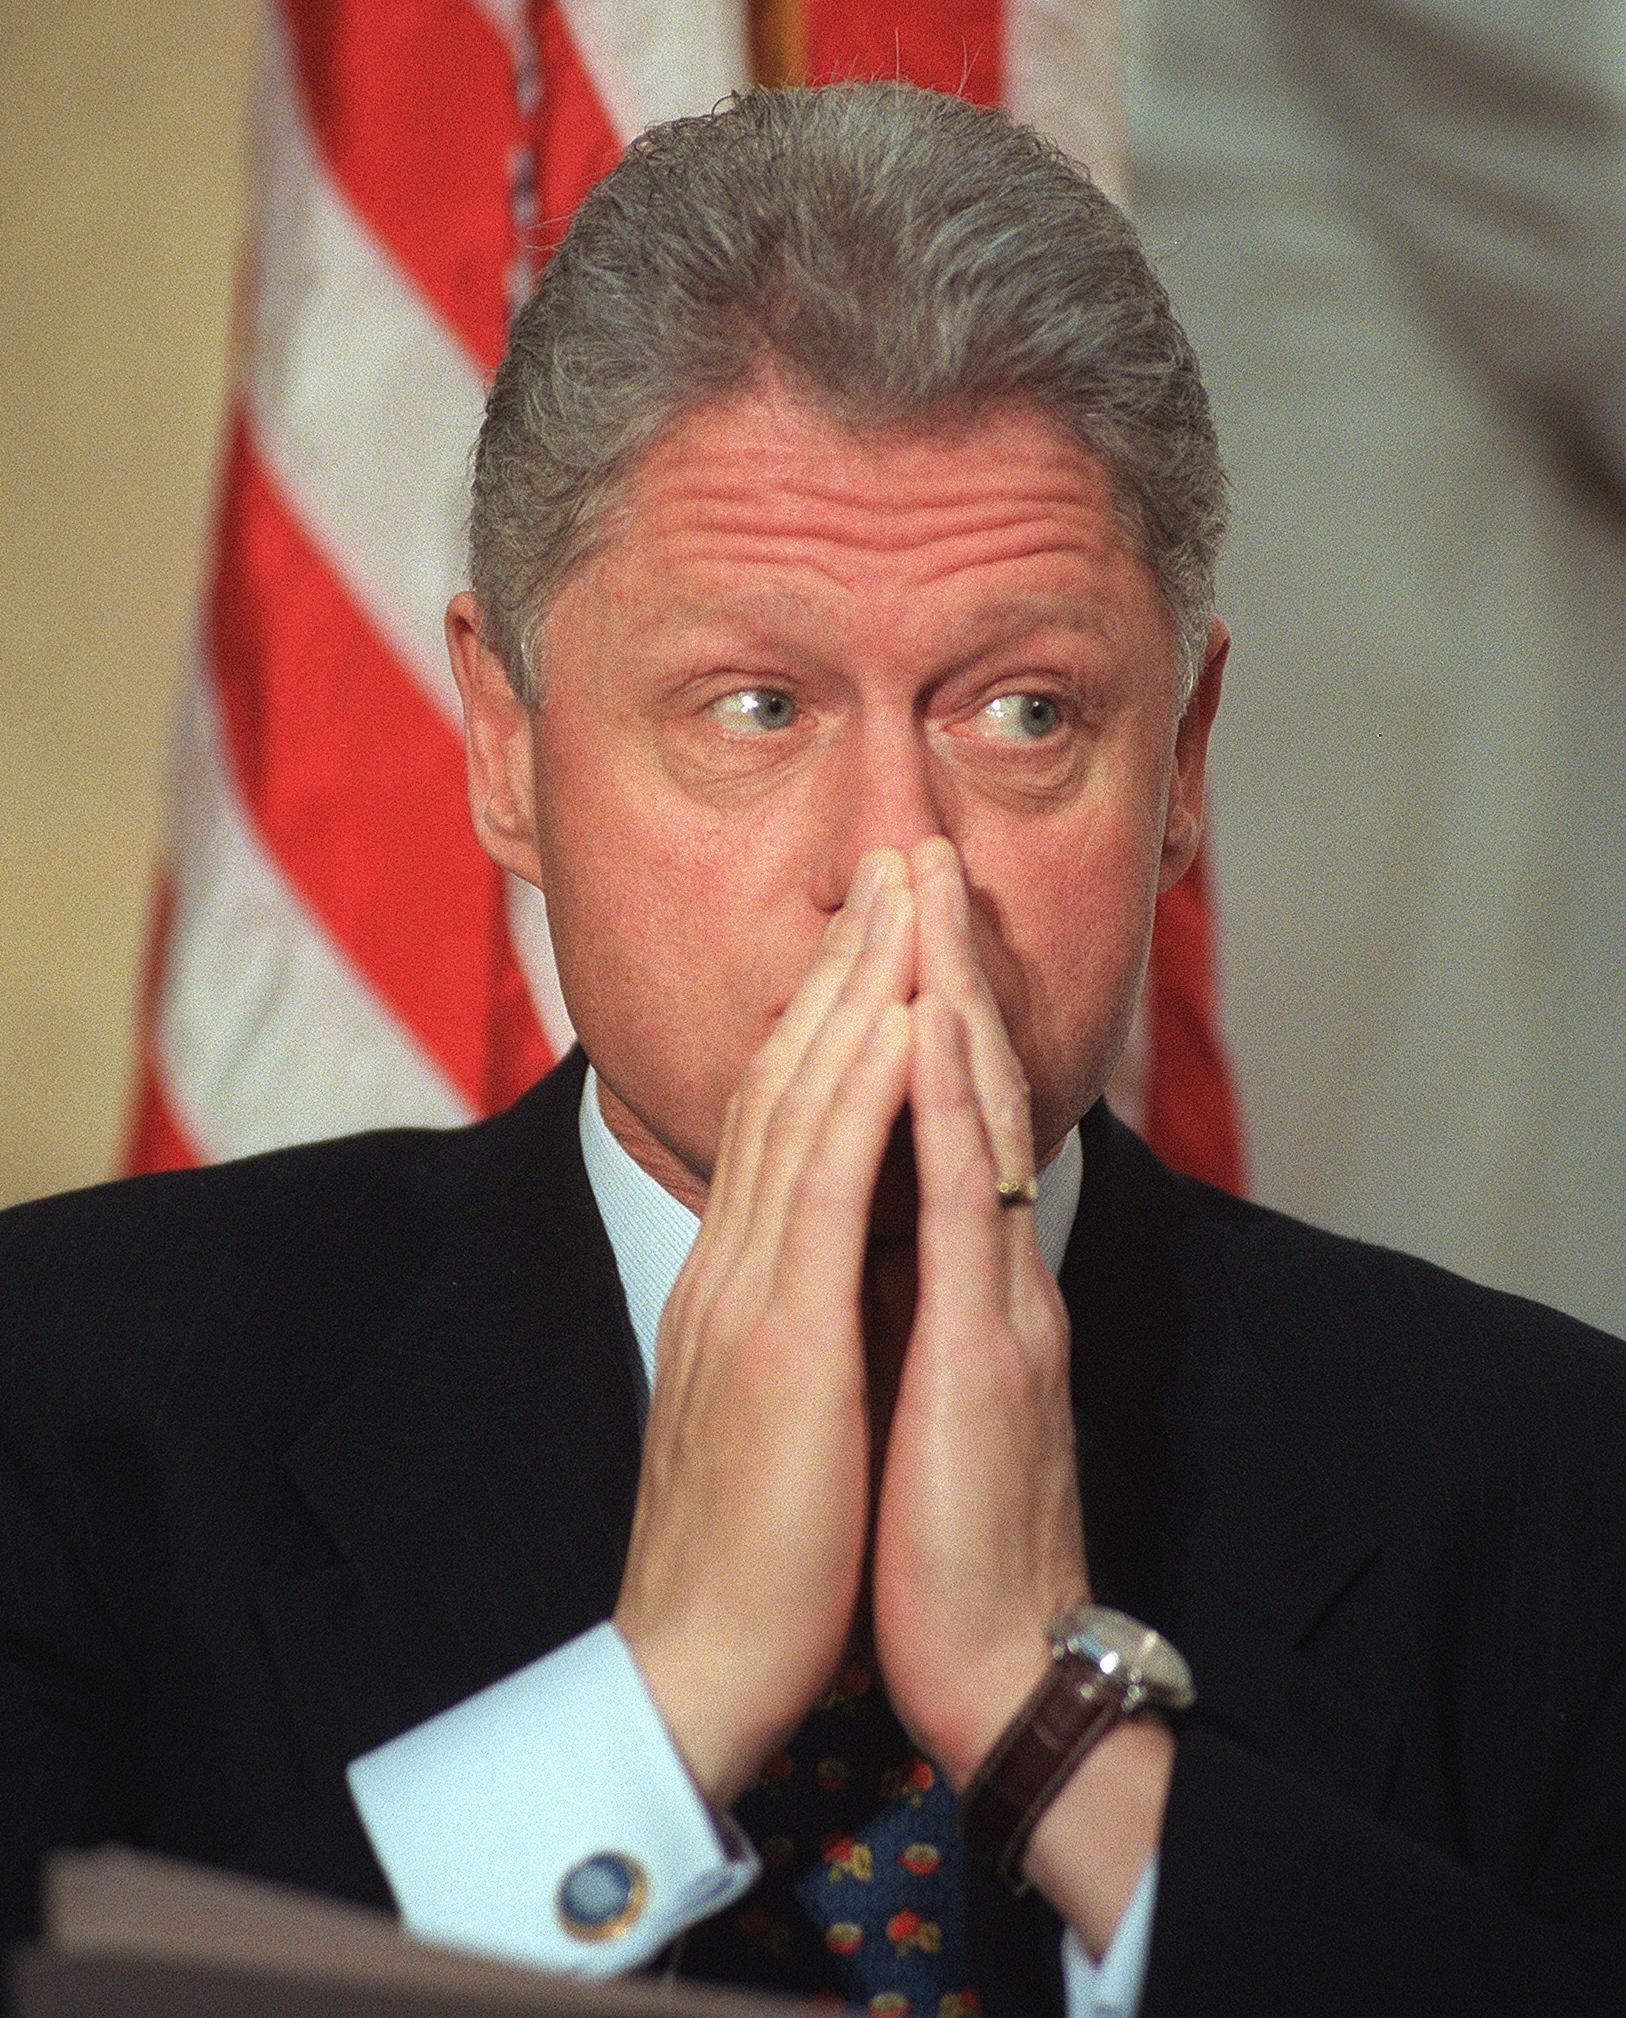 US President Bill Clinton listens during ceremonie